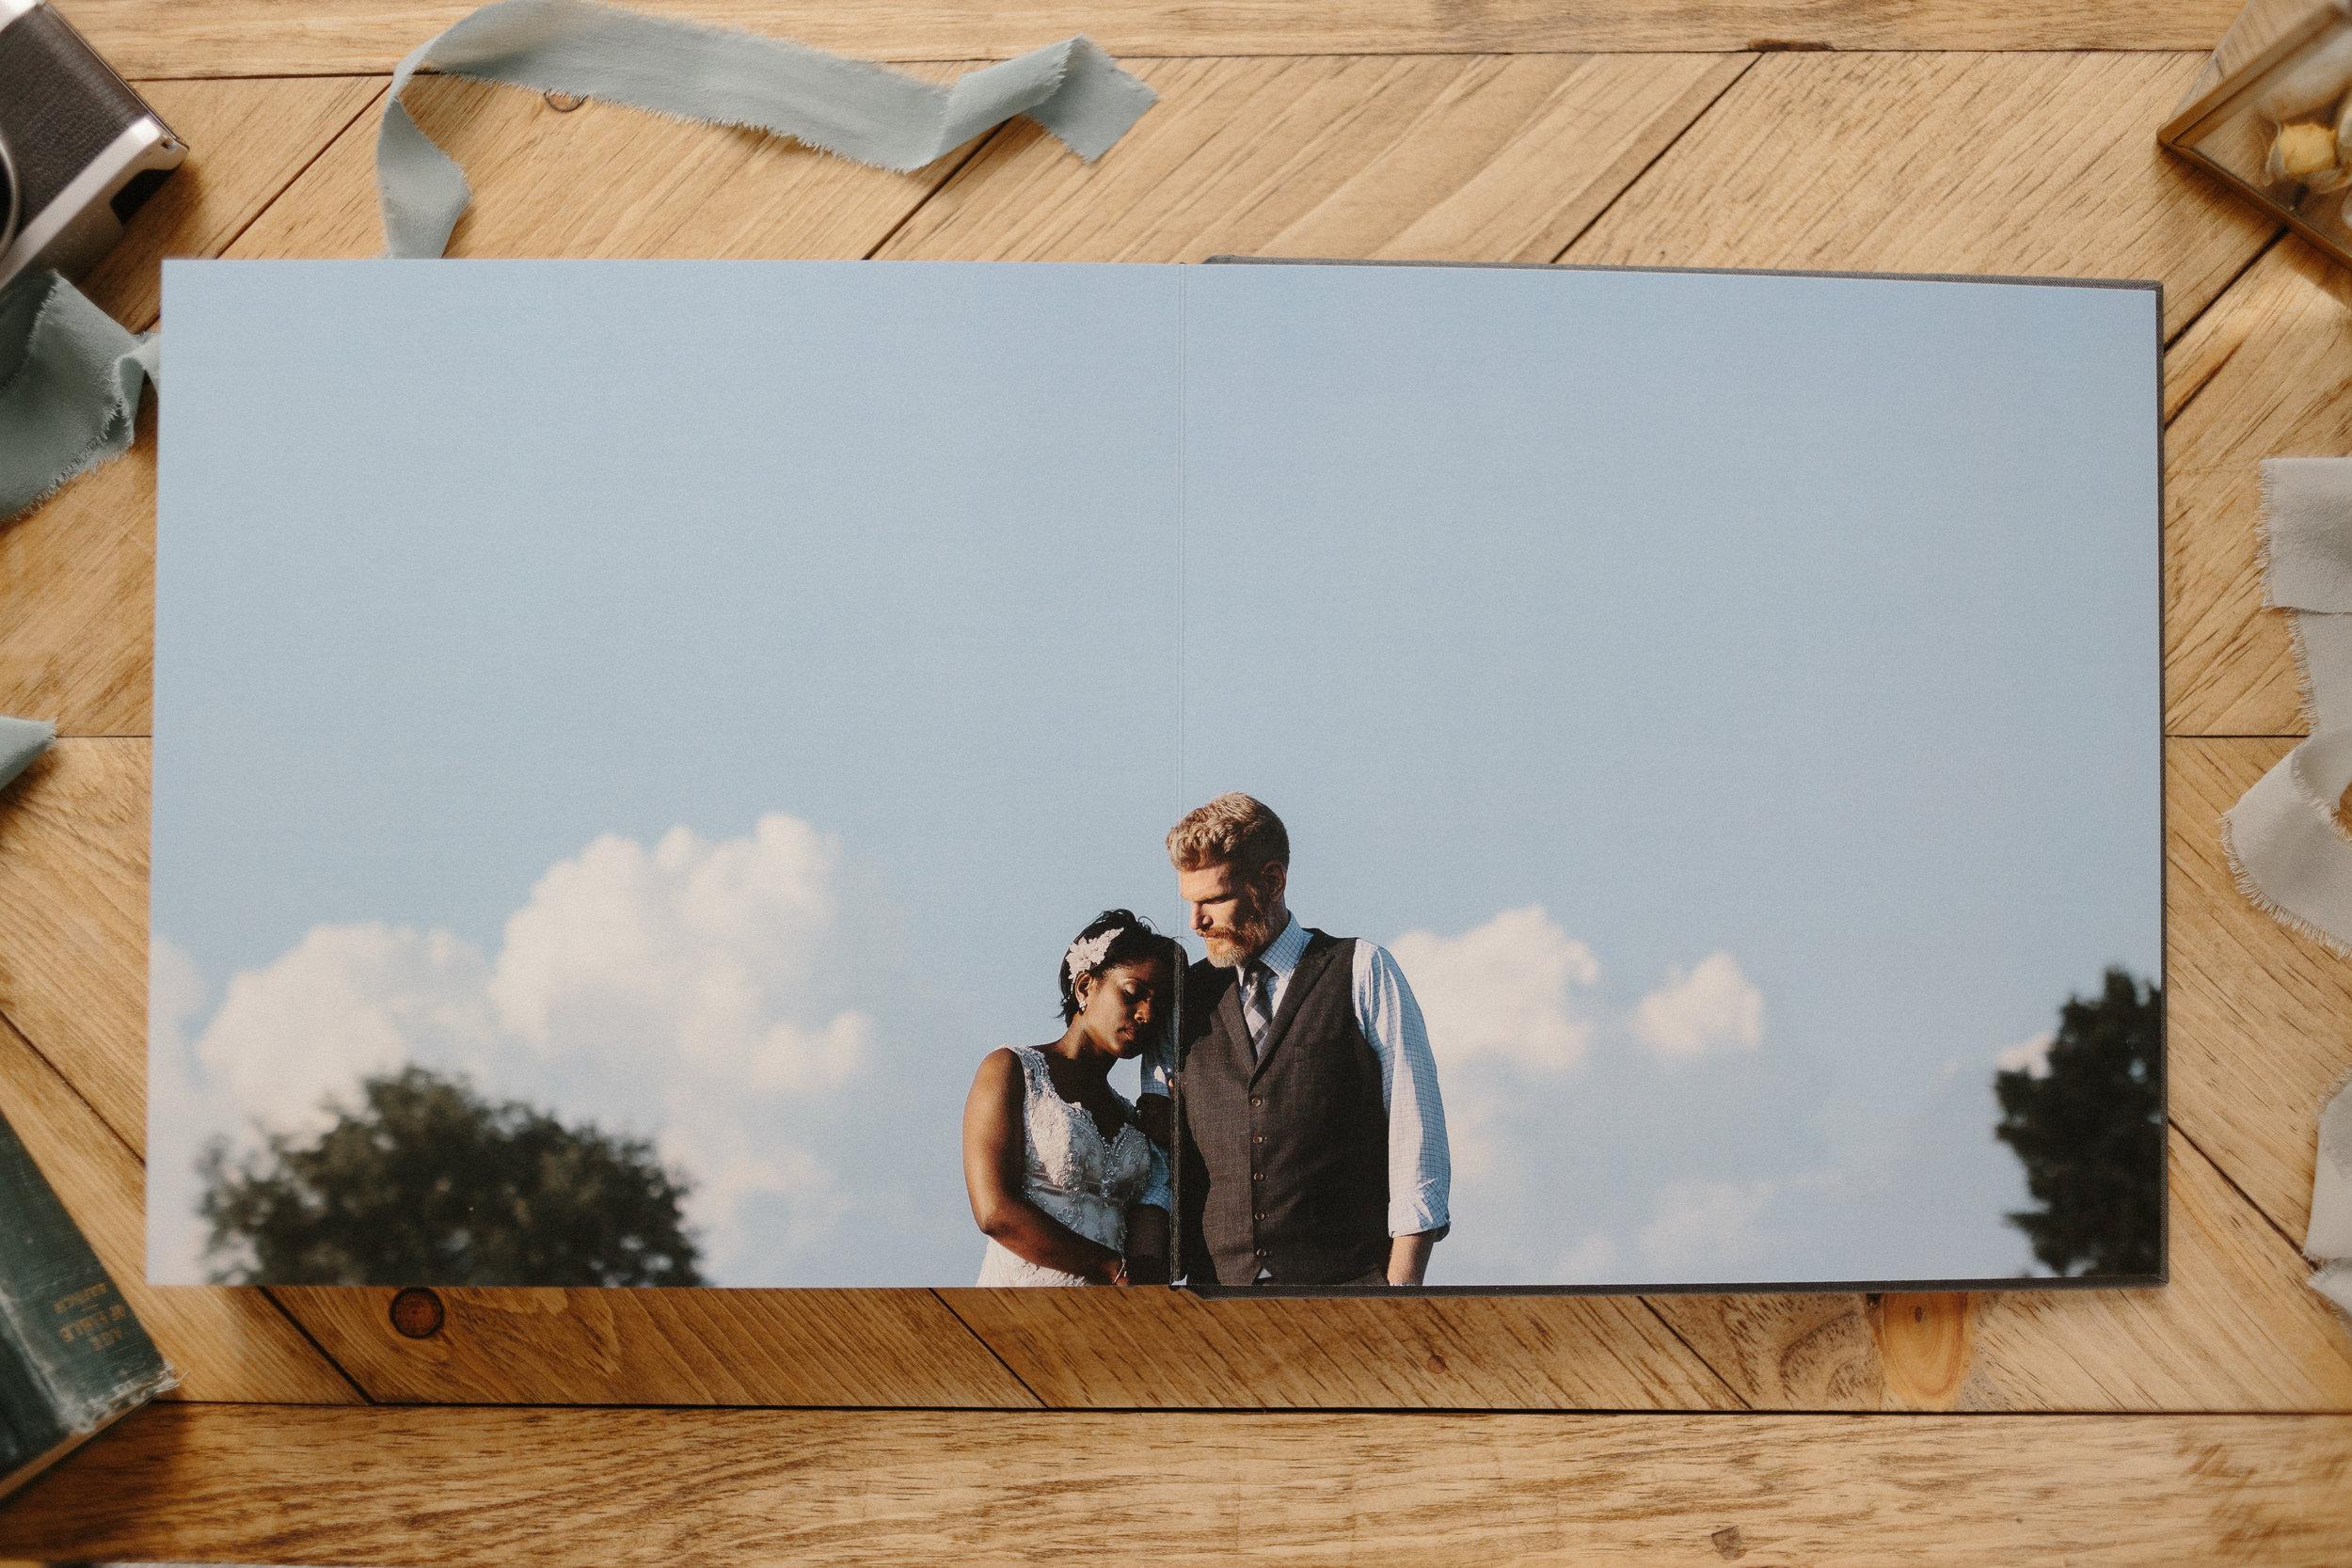 ryanne-hollies-photography-wedding-album-design-details-tono-and-co-artifact-uprising-59.jpg